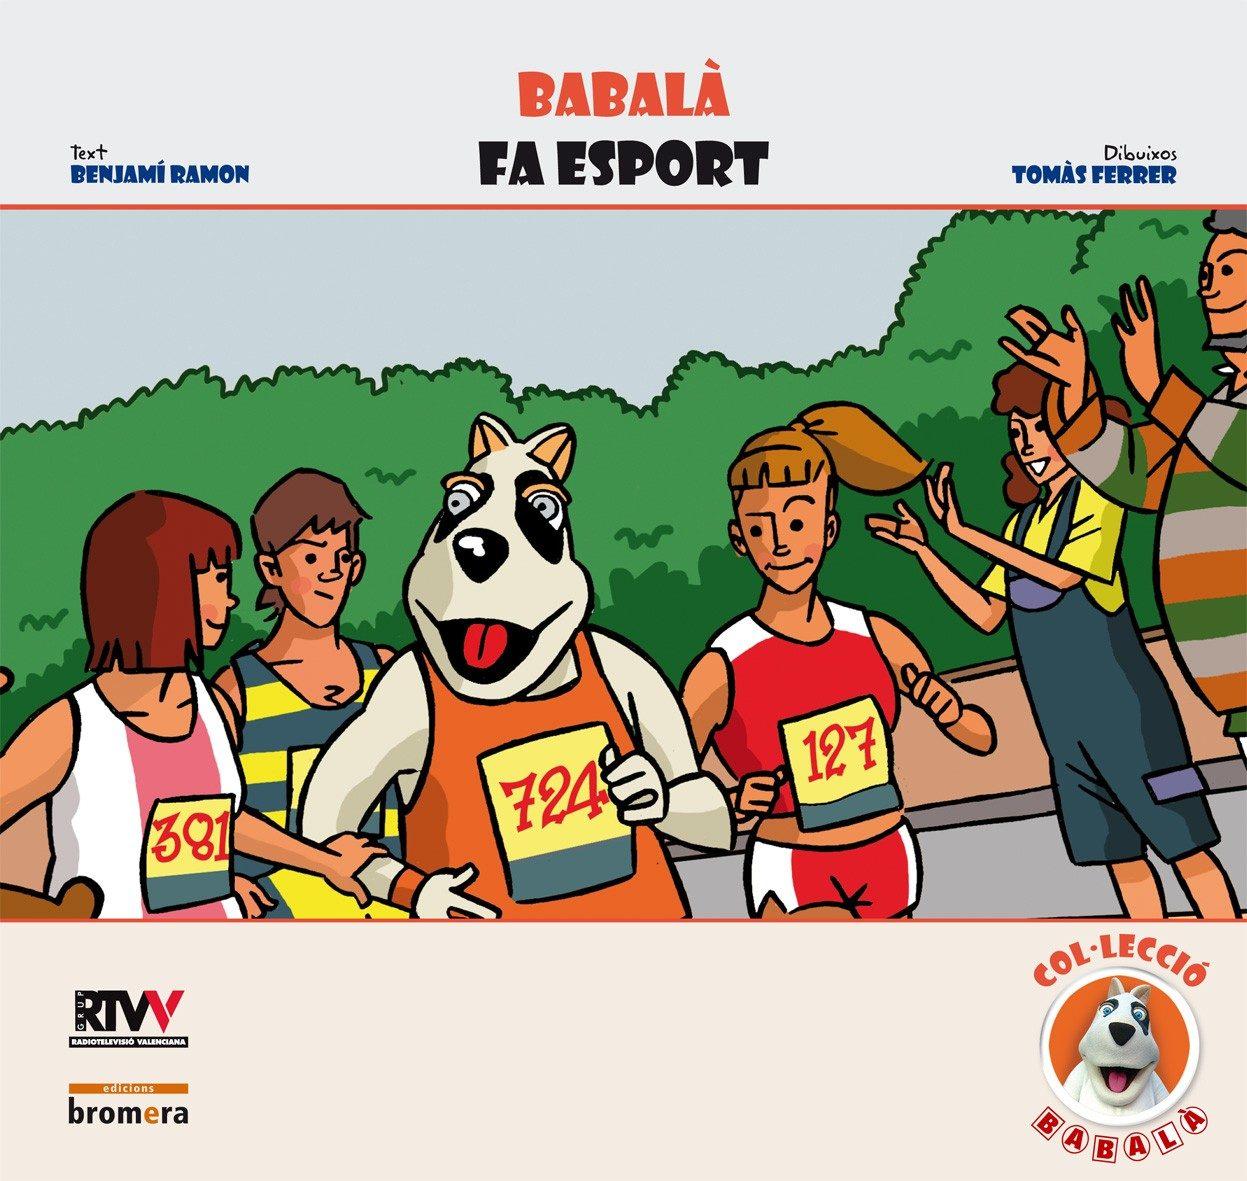 Babala Fa Esport por Tomas Ferrer